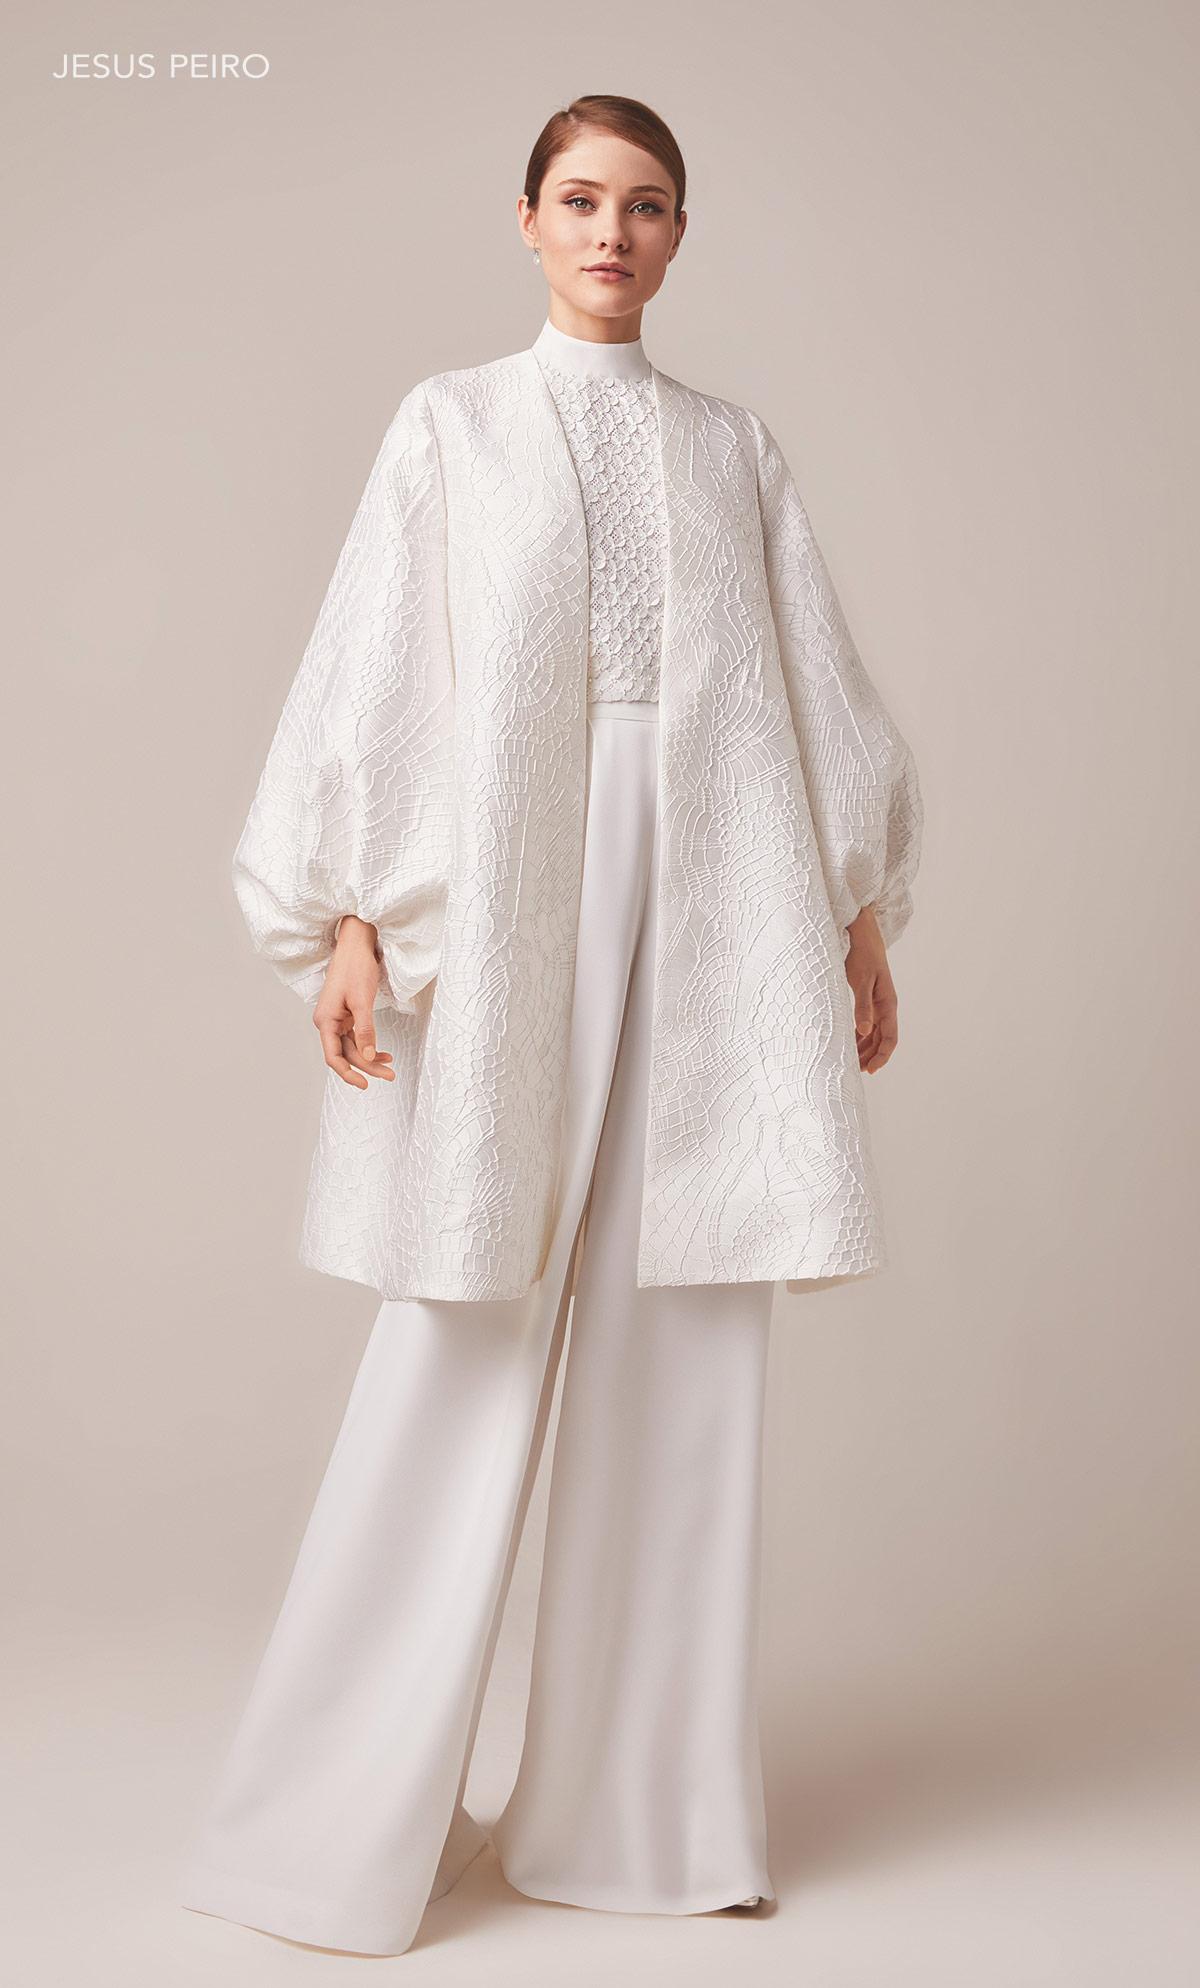 Vestido novia Jesús Peiró Ref.154